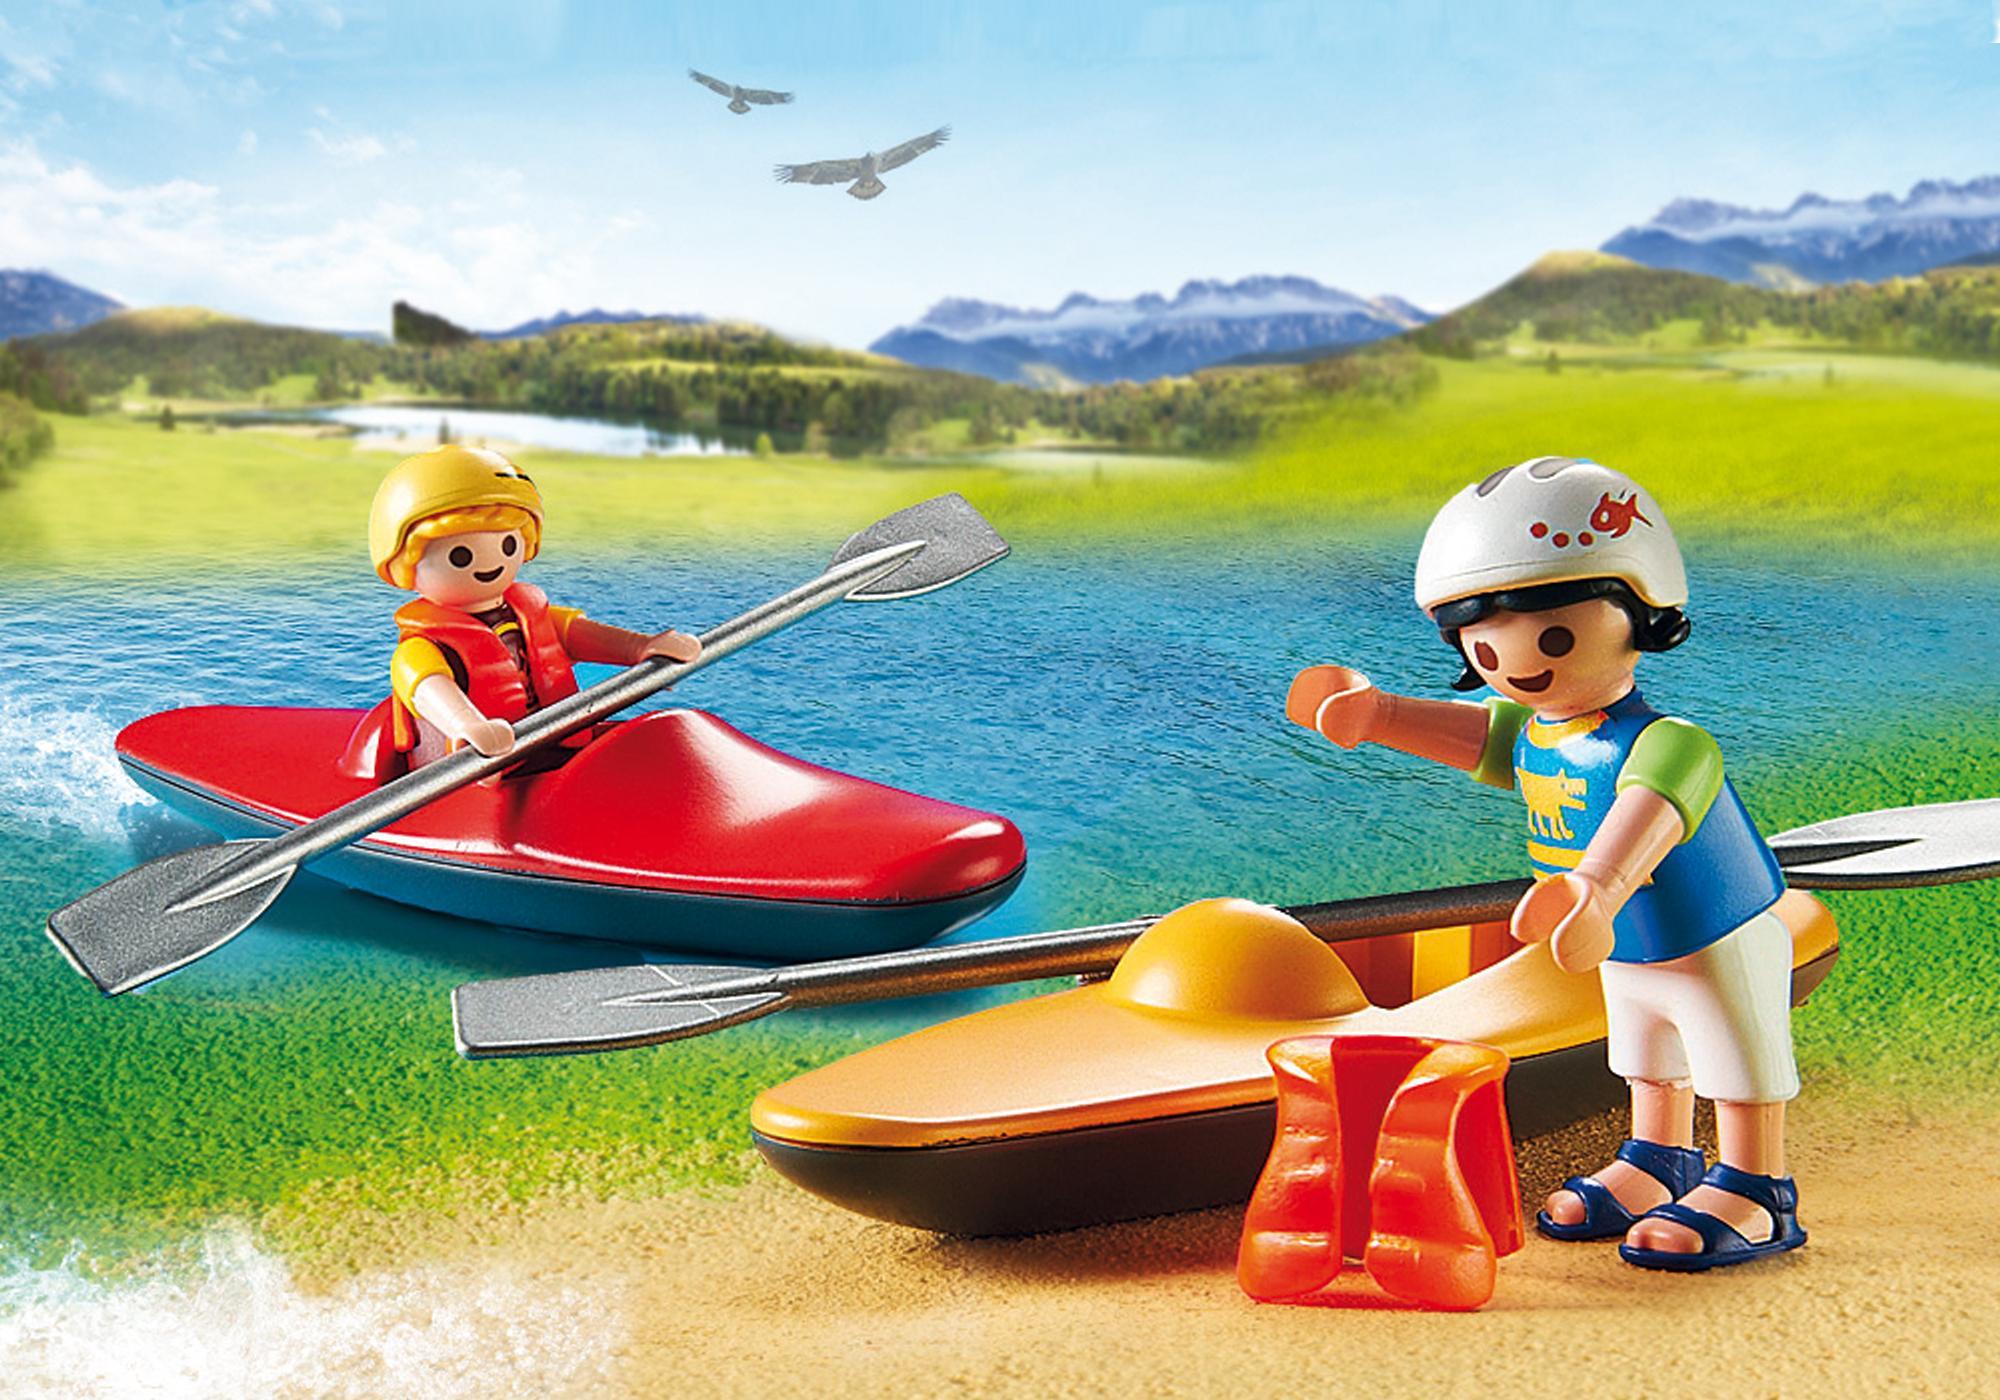 http://media.playmobil.com/i/playmobil/6889_product_extra1